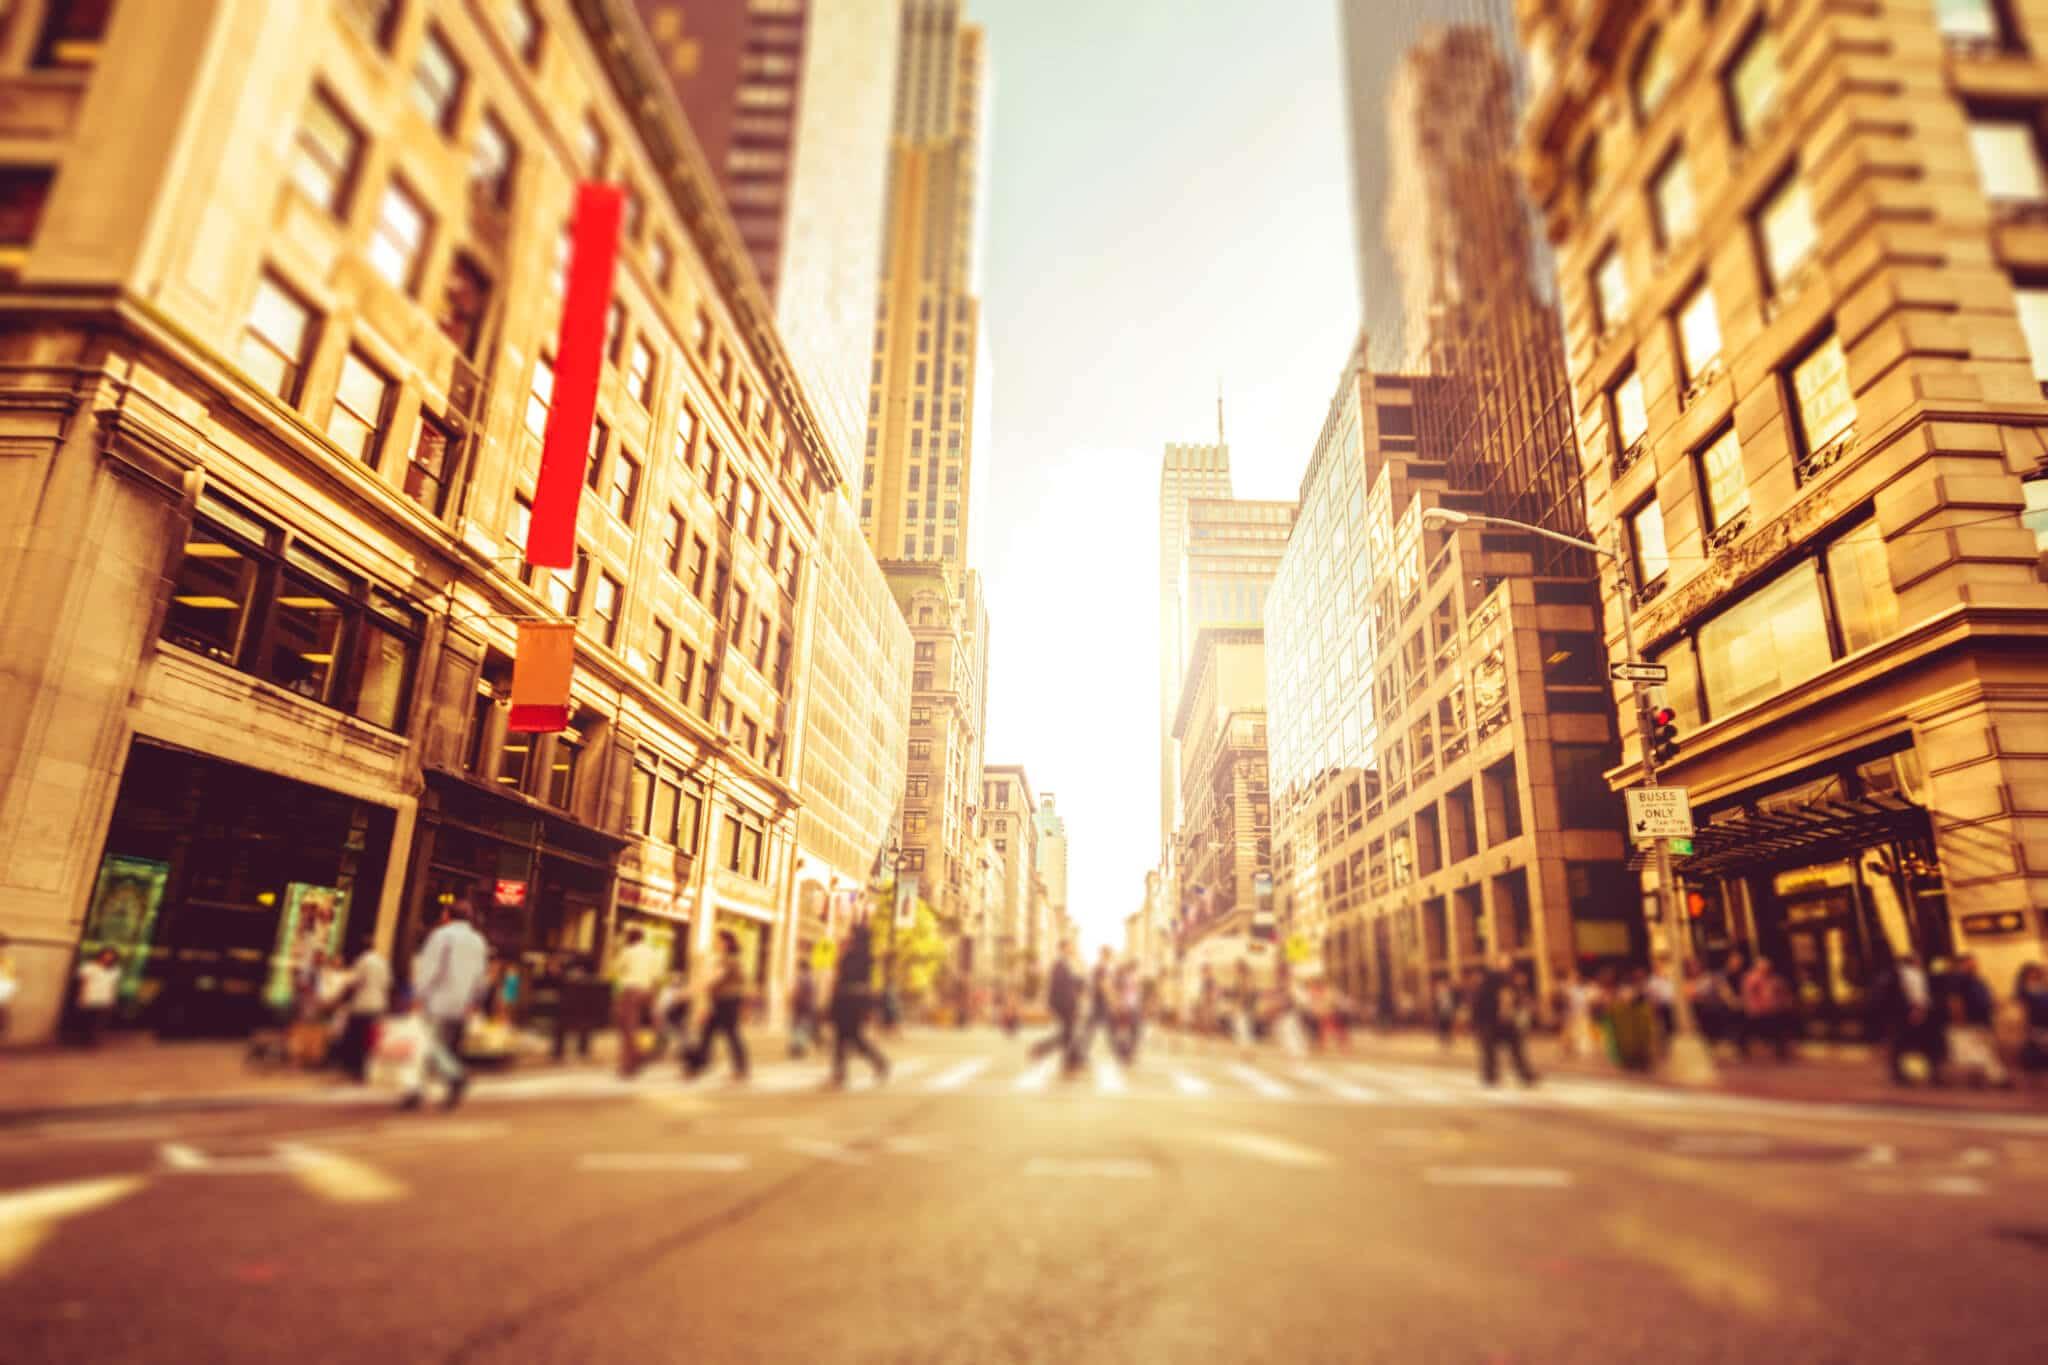 VERTEX, Constrcution, Owner's Representation, 38 Grand Street Retail Conversion NYC